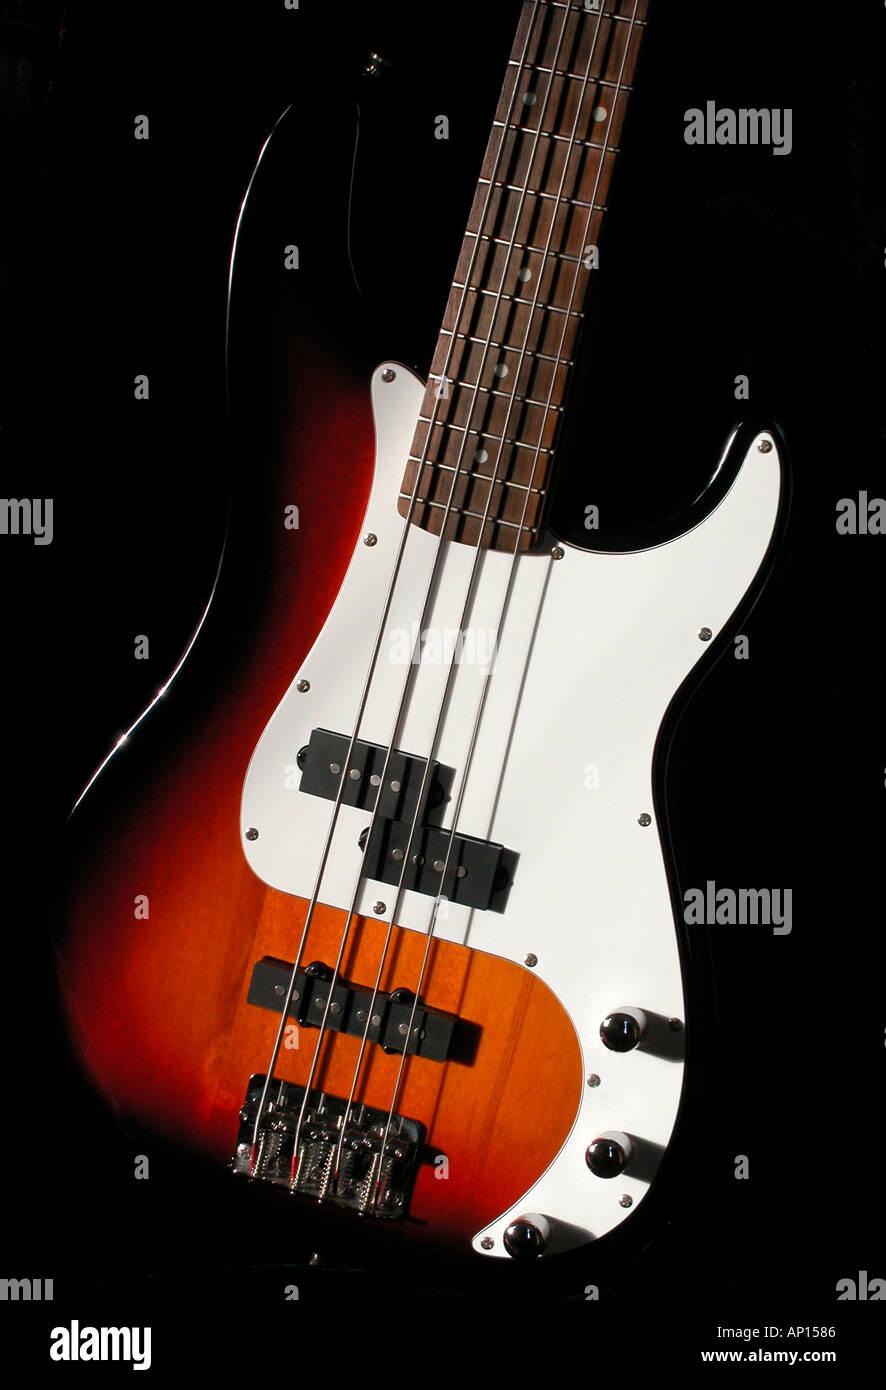 Fender Squier Jazz Bass body, 4 string sunburst, 2 single coil pickups, white pickguard, rosewood fingerboard - Stock Image